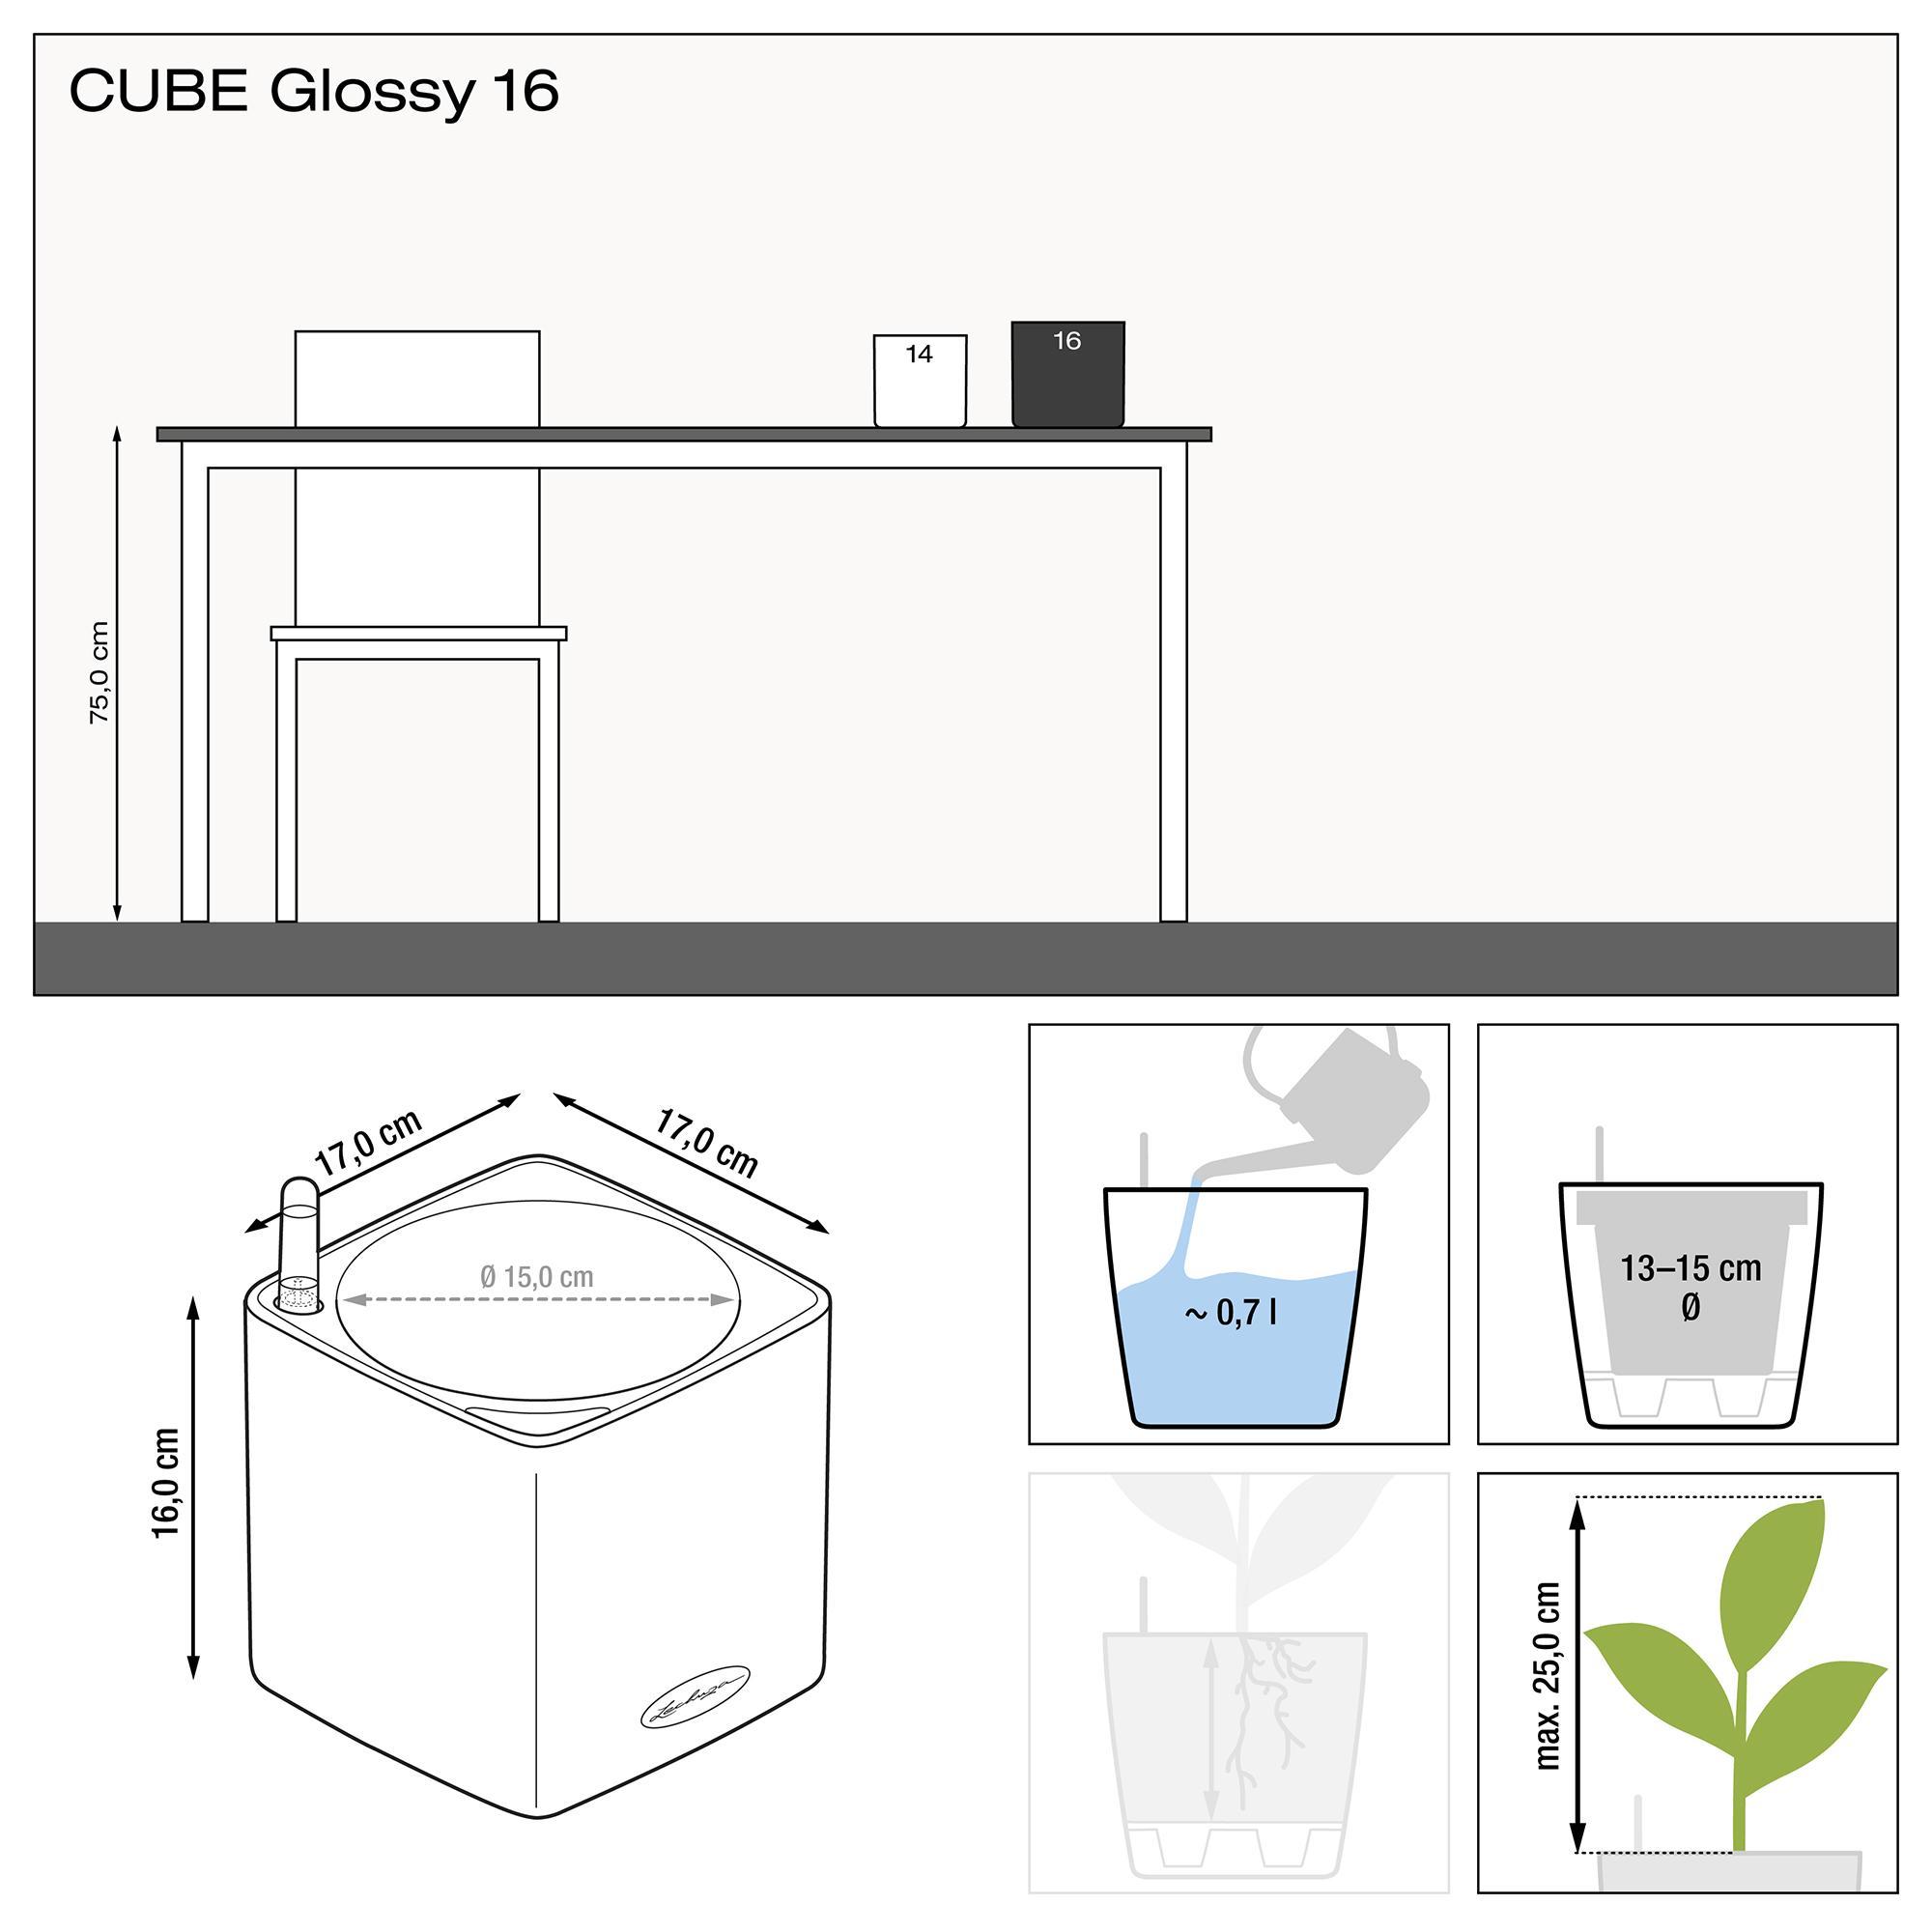 le_cube-glossy16_product_addi_nz